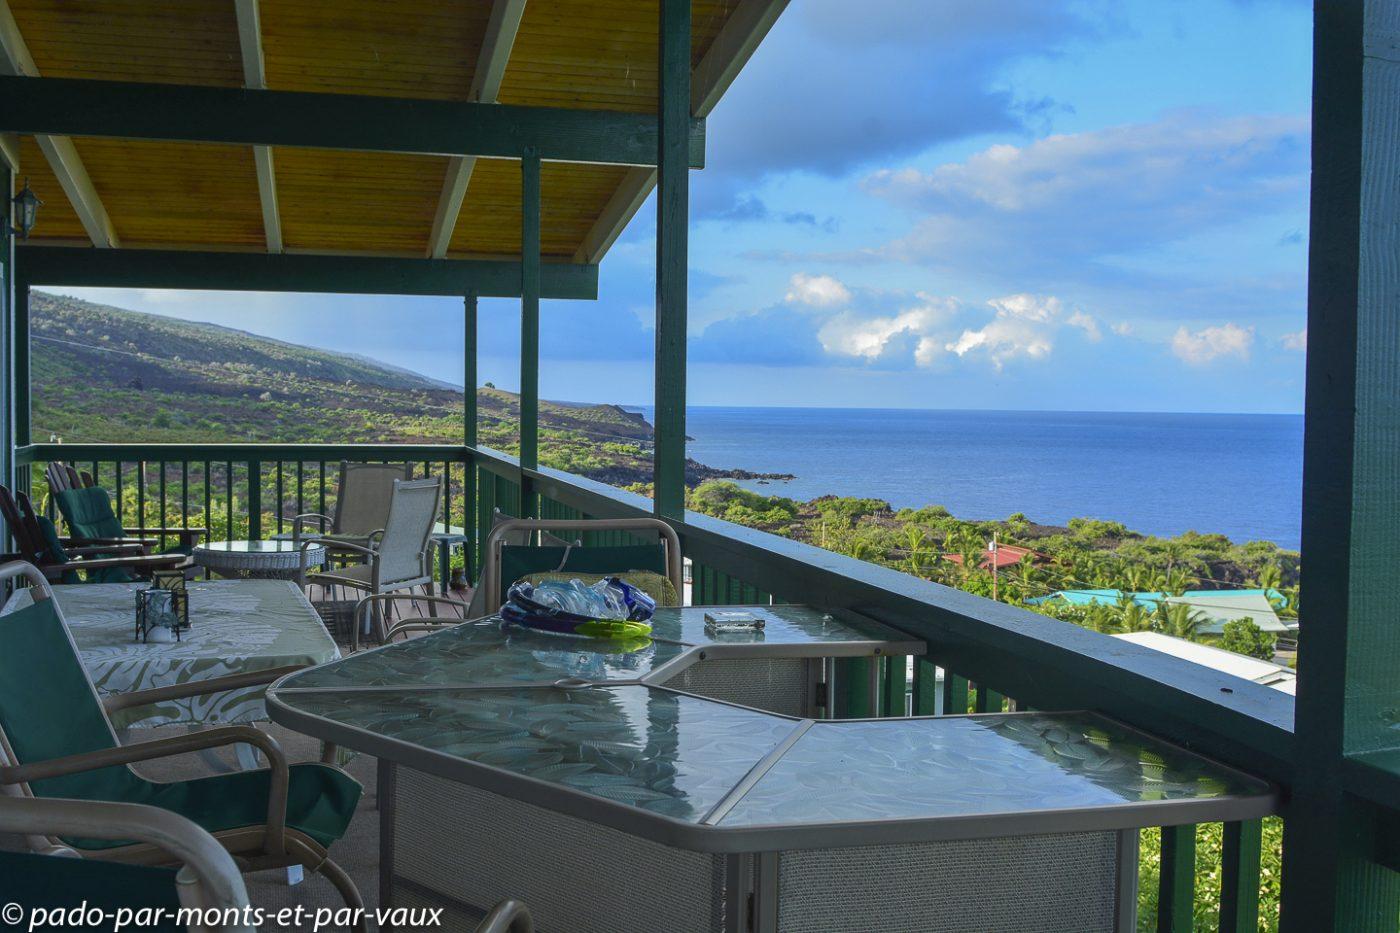 Big Island - Paradise cove